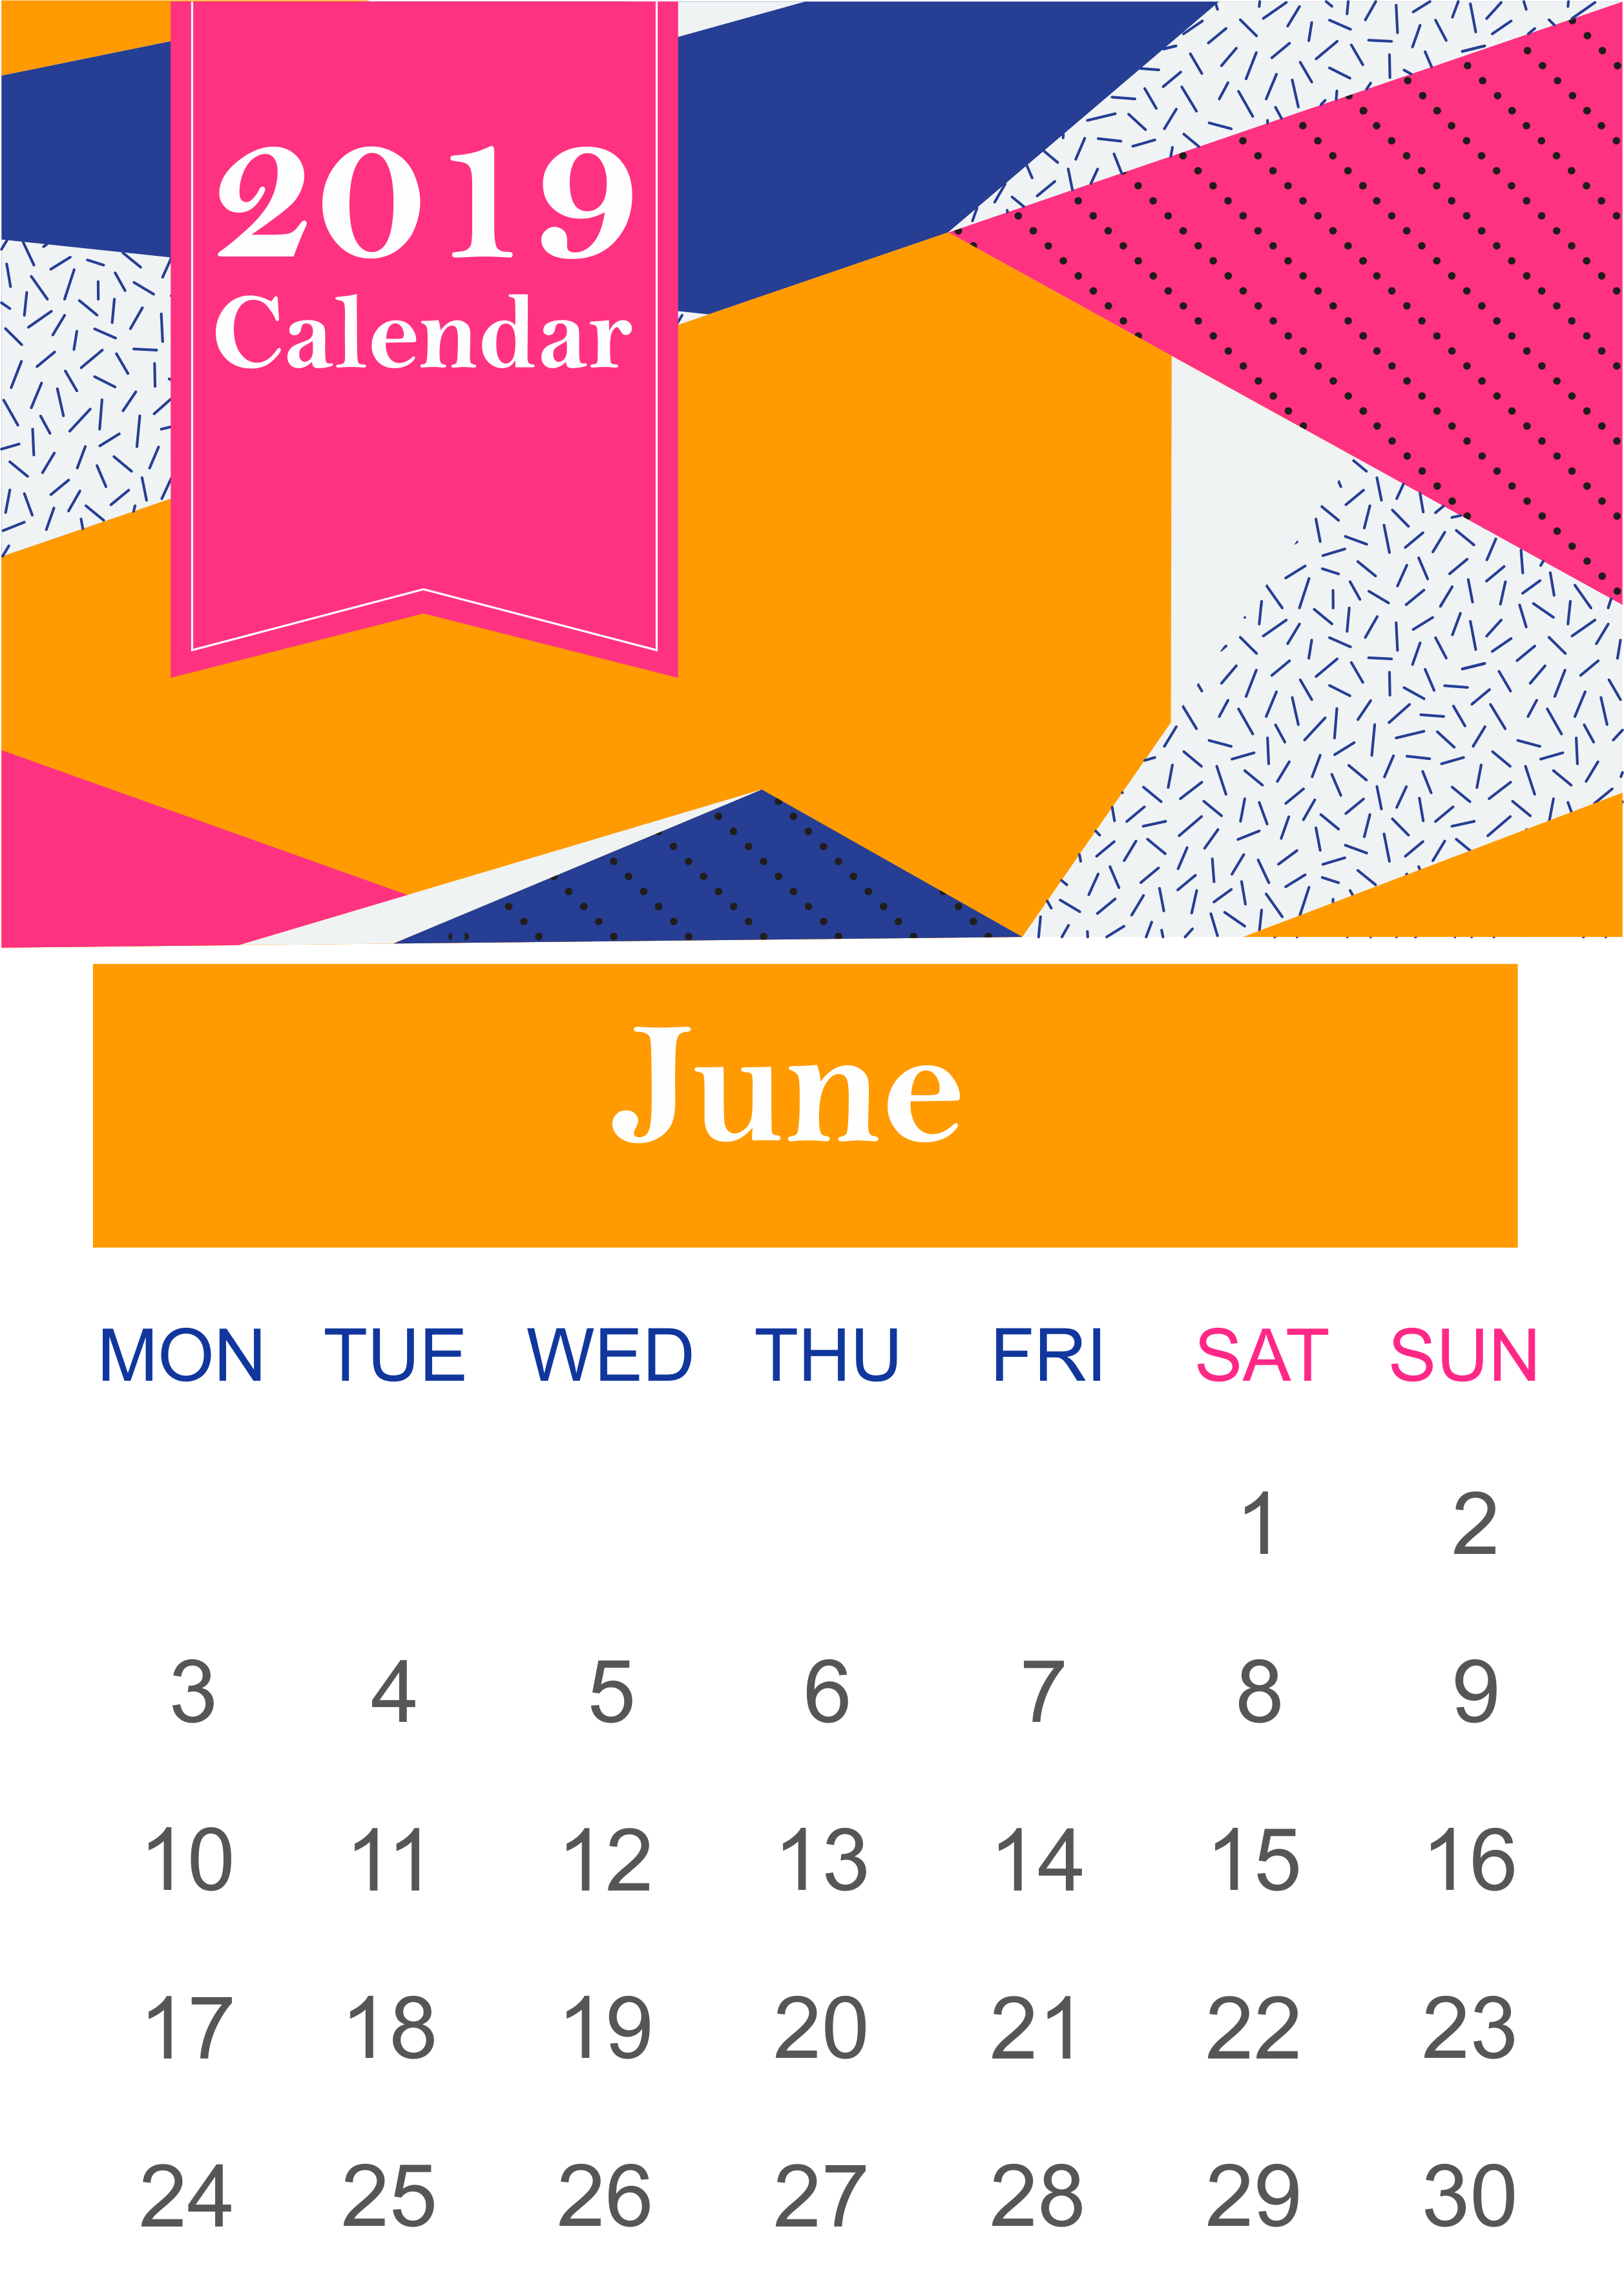 June 2019 Calendar Page